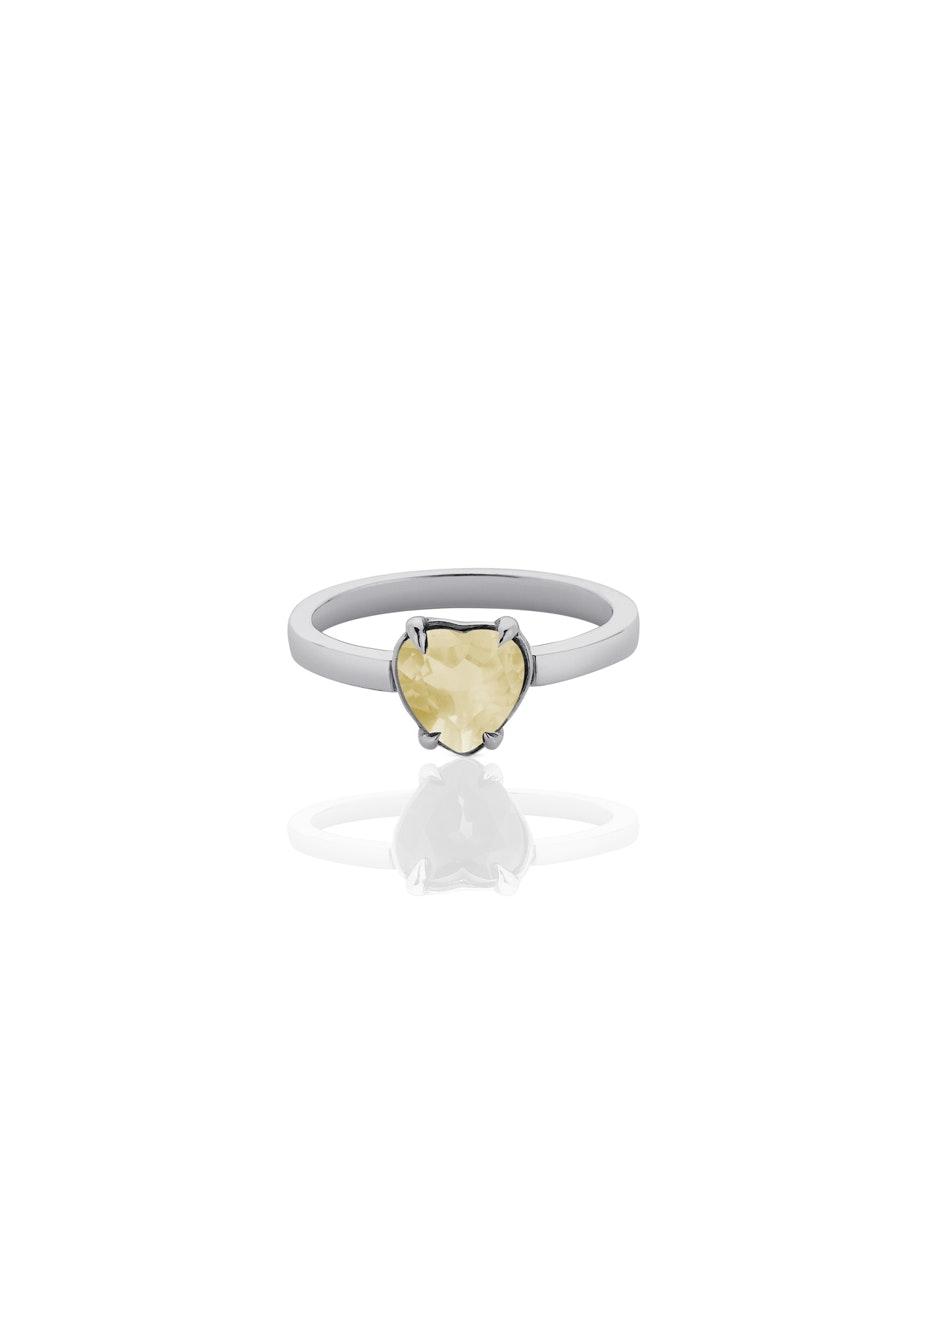 Meadowlark - Heart Jewel Ring - Citrine